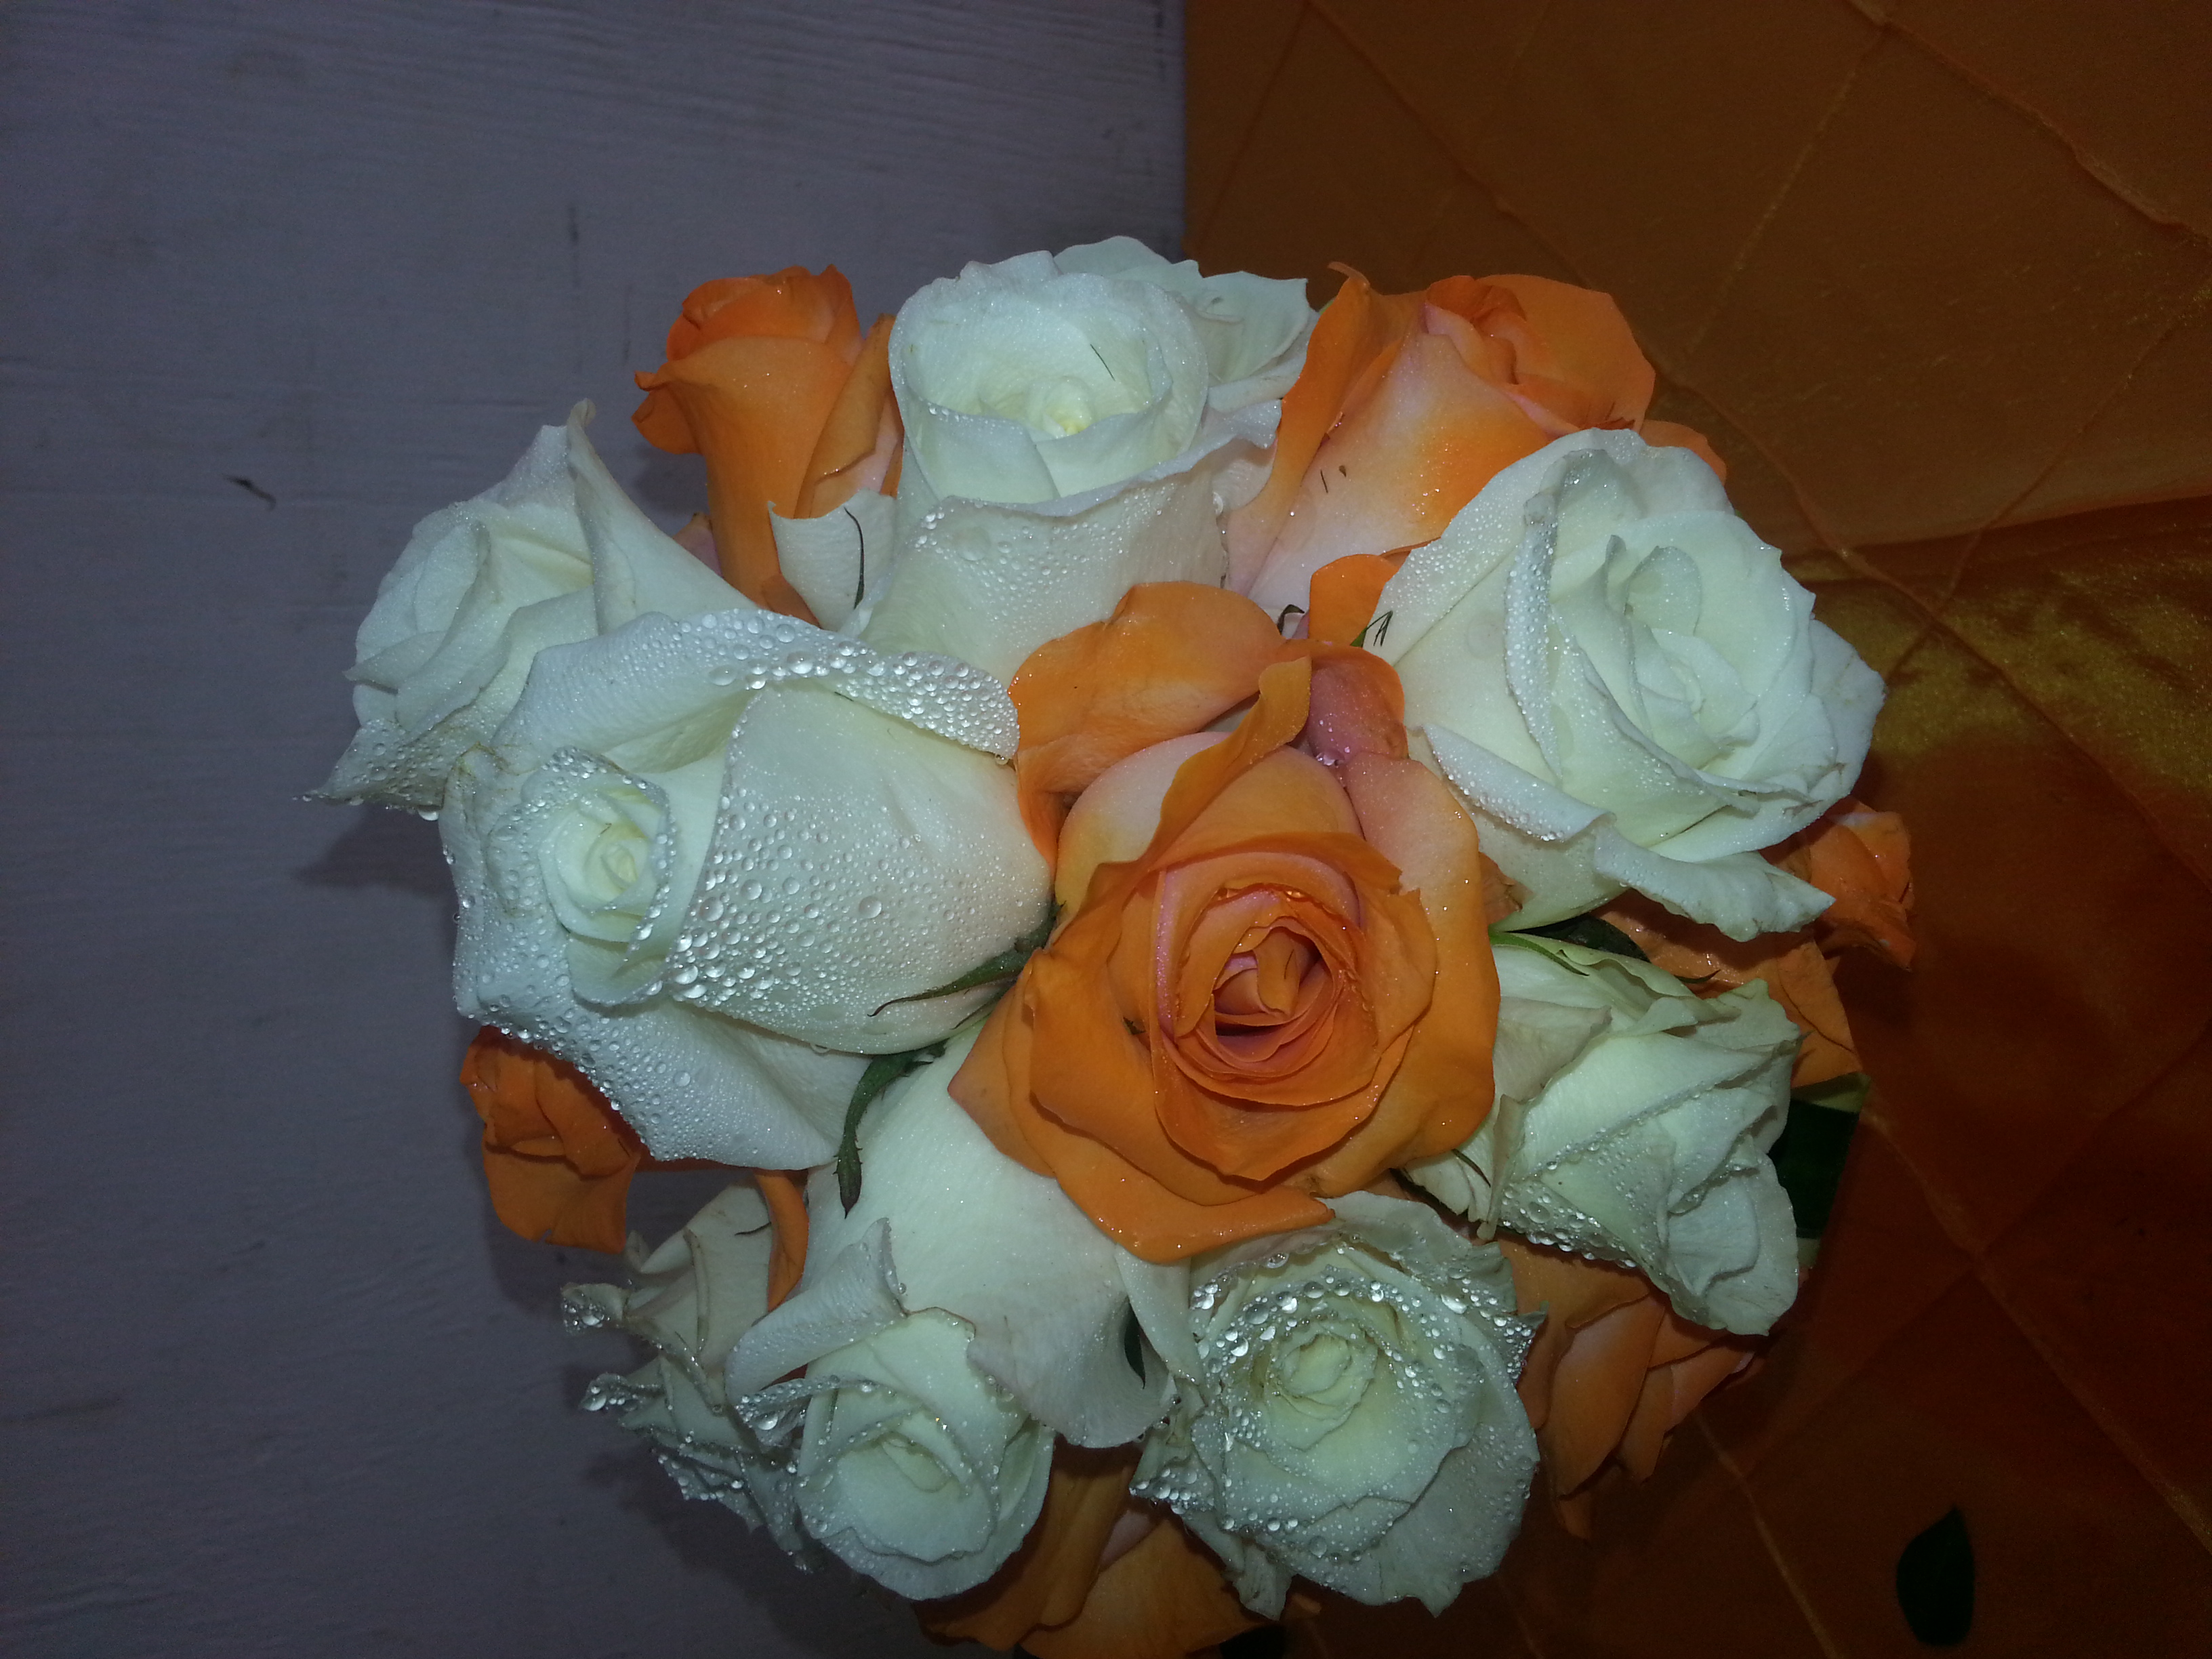 Orange & White Roses